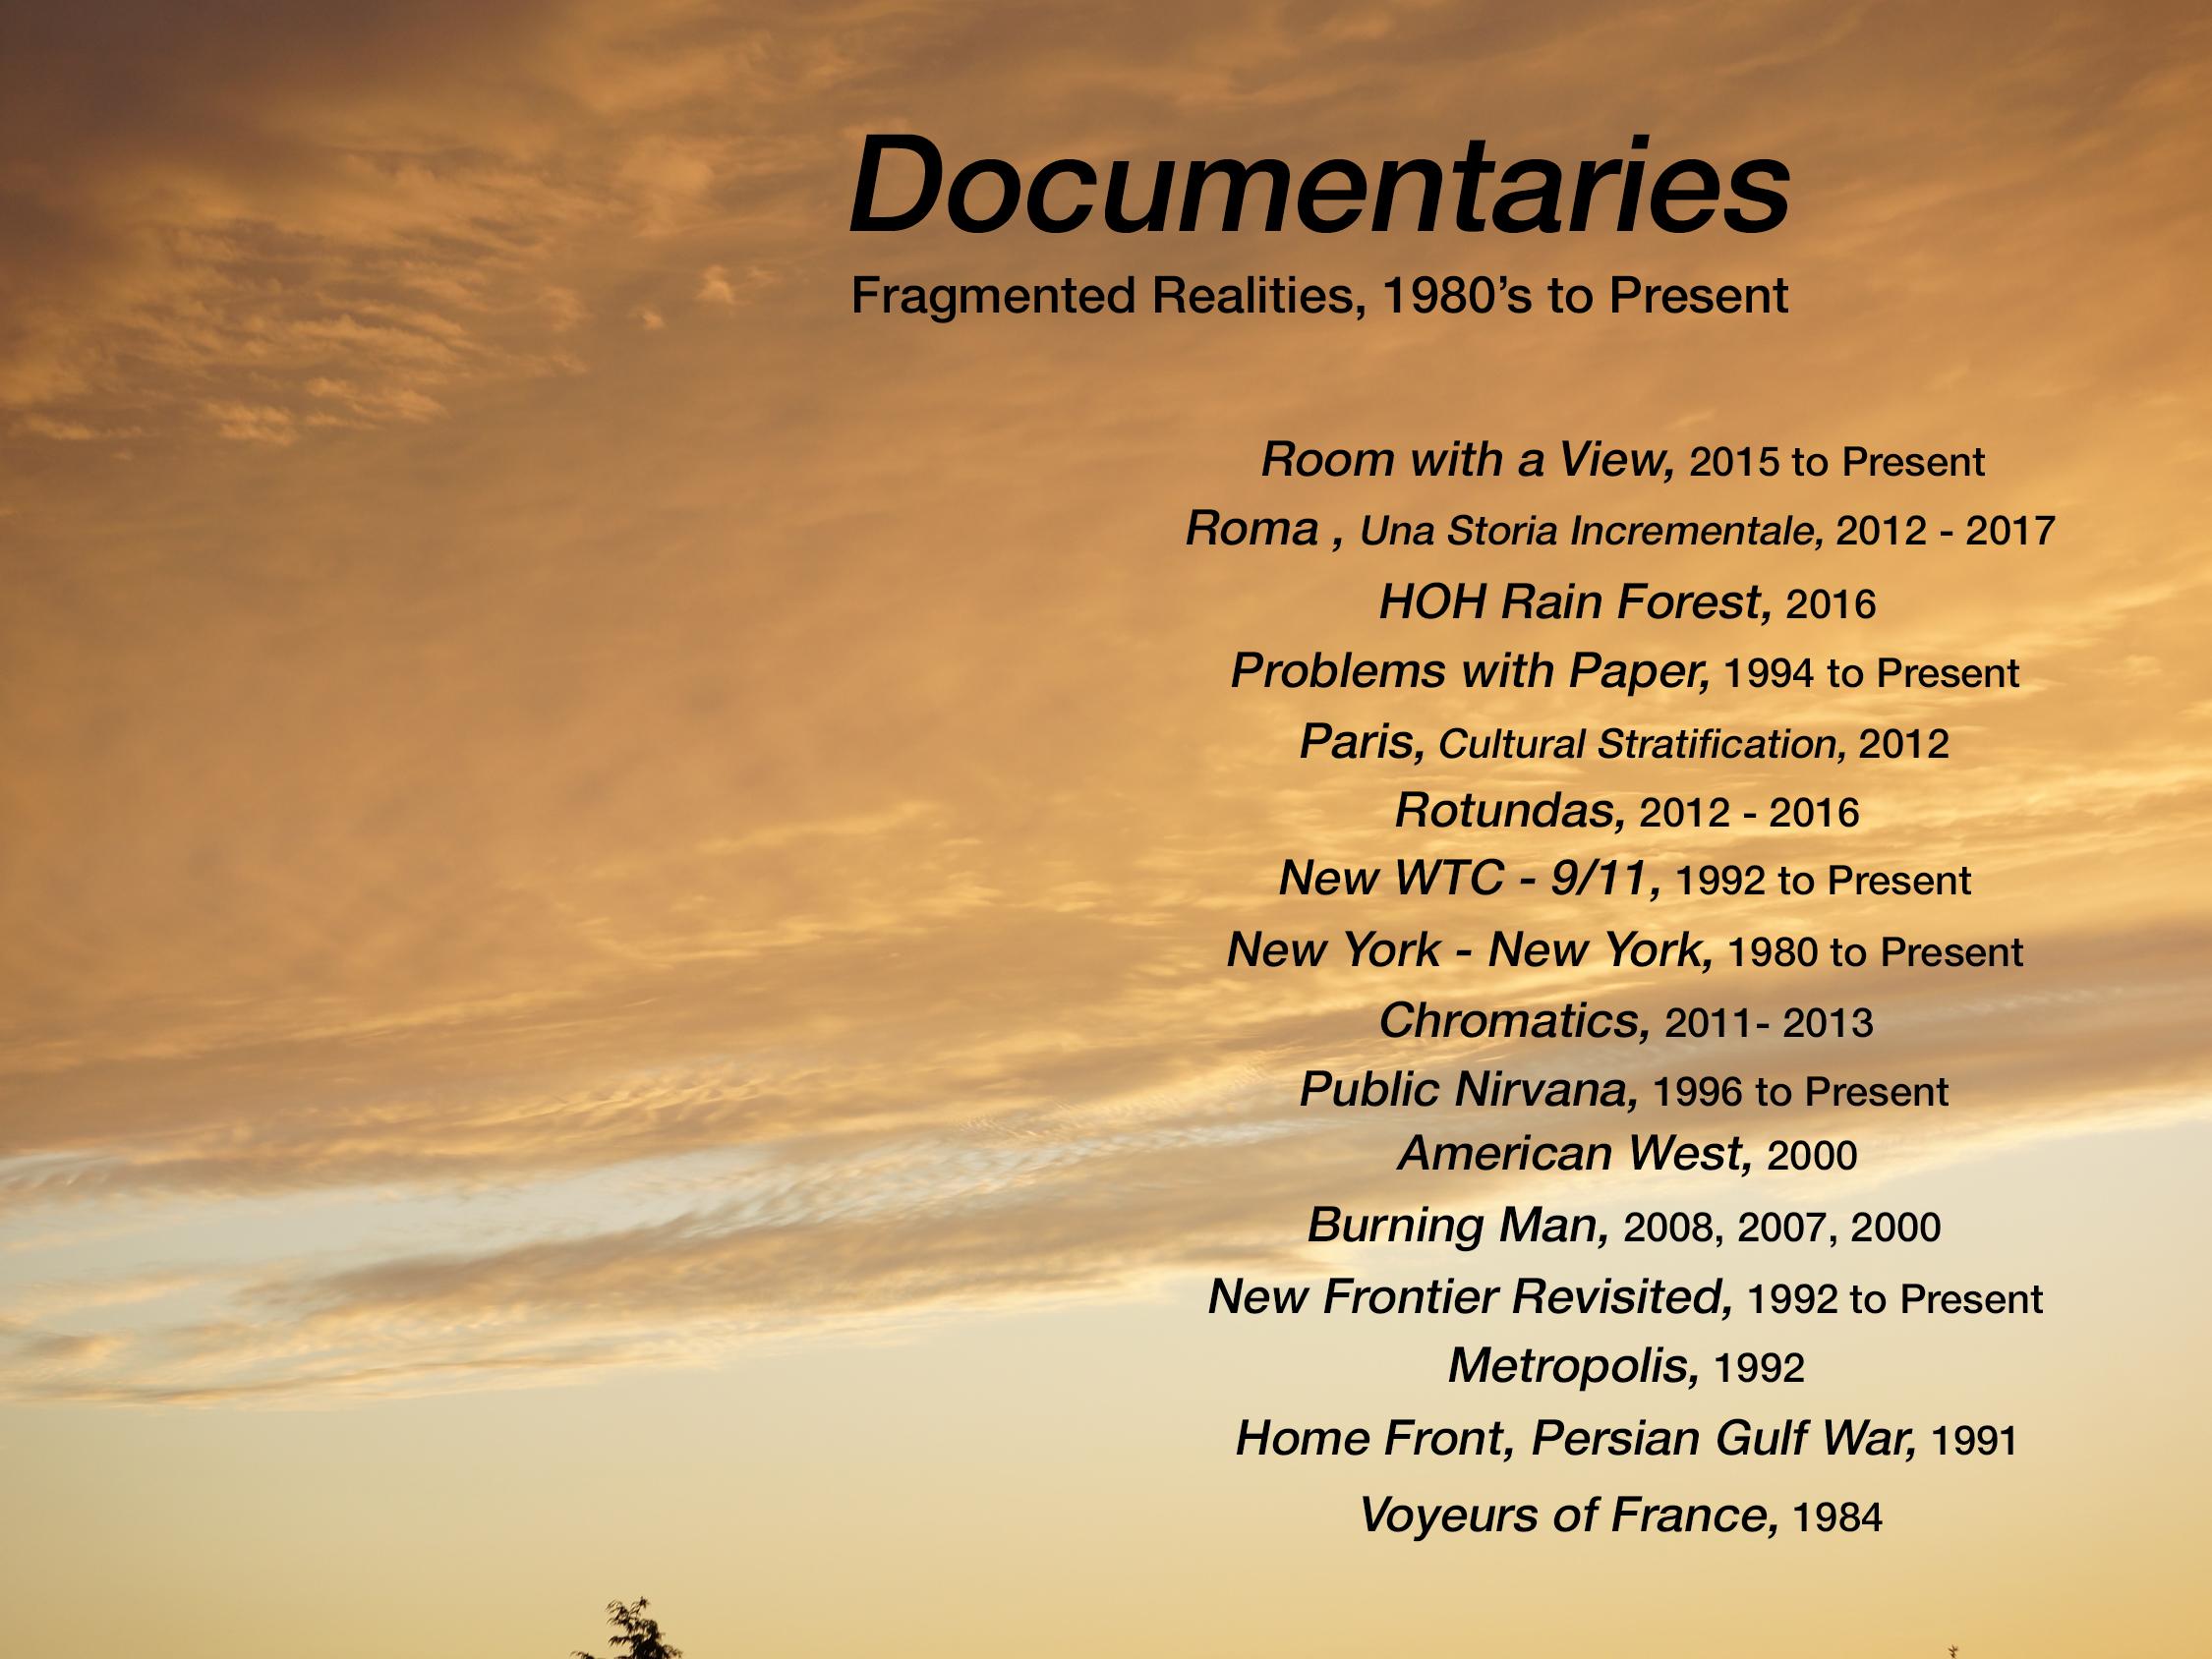 1.IV. Documentaries Cover.jpg